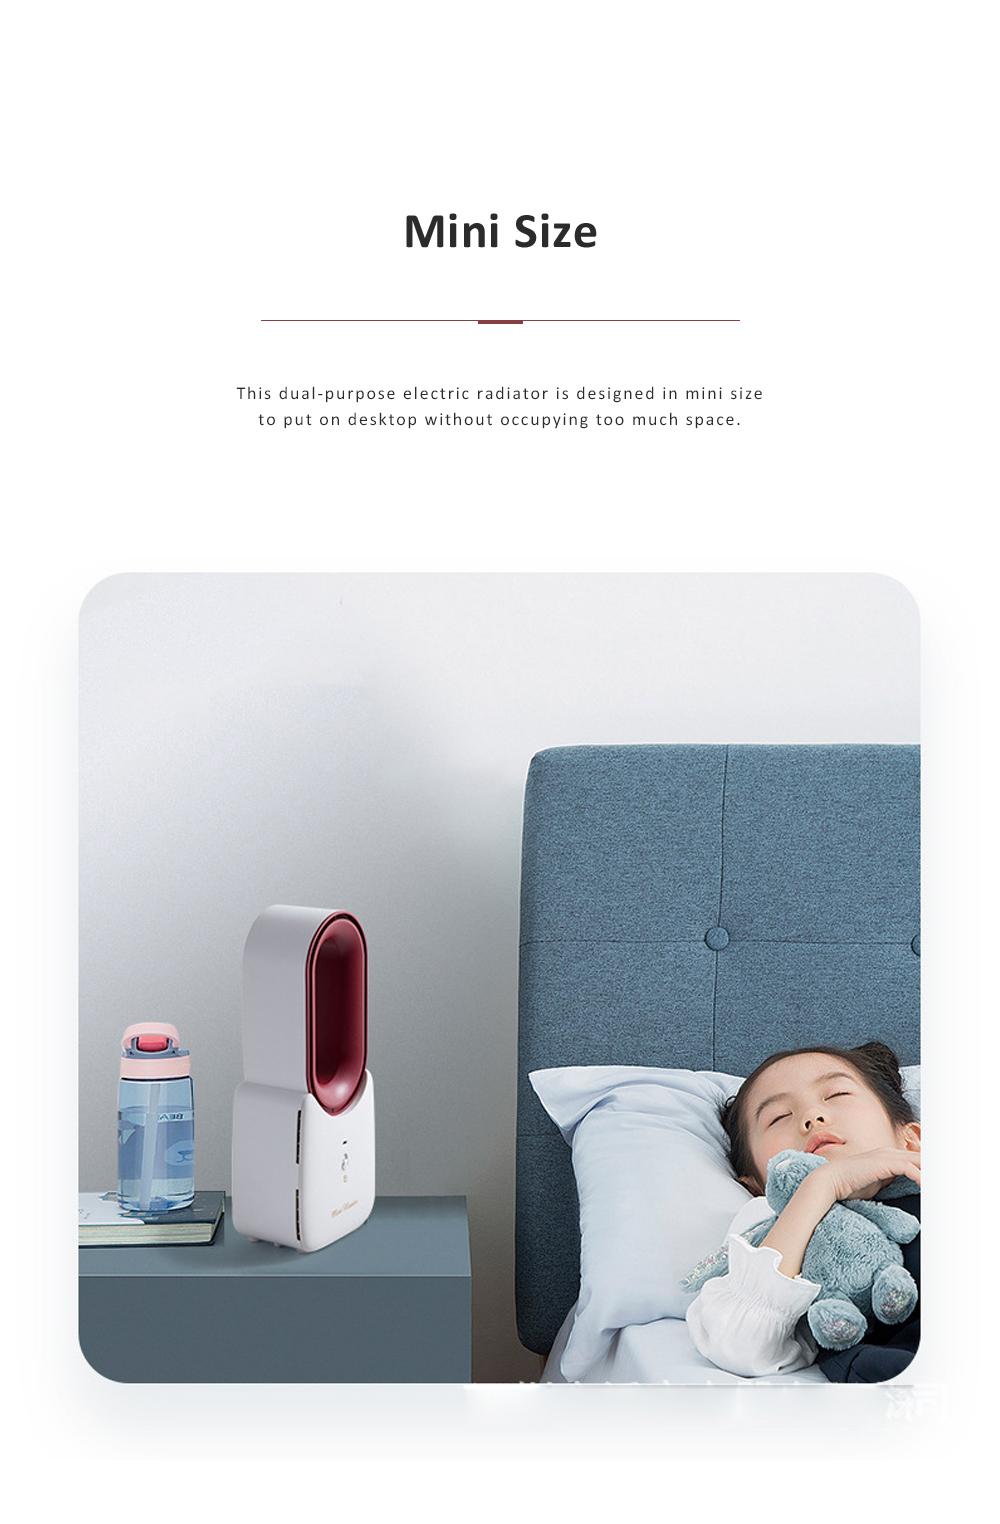 Home Office Desktop Heater for Energy-saving Mini Warmer Blade Free Dual-purpose Electric Radiator 11